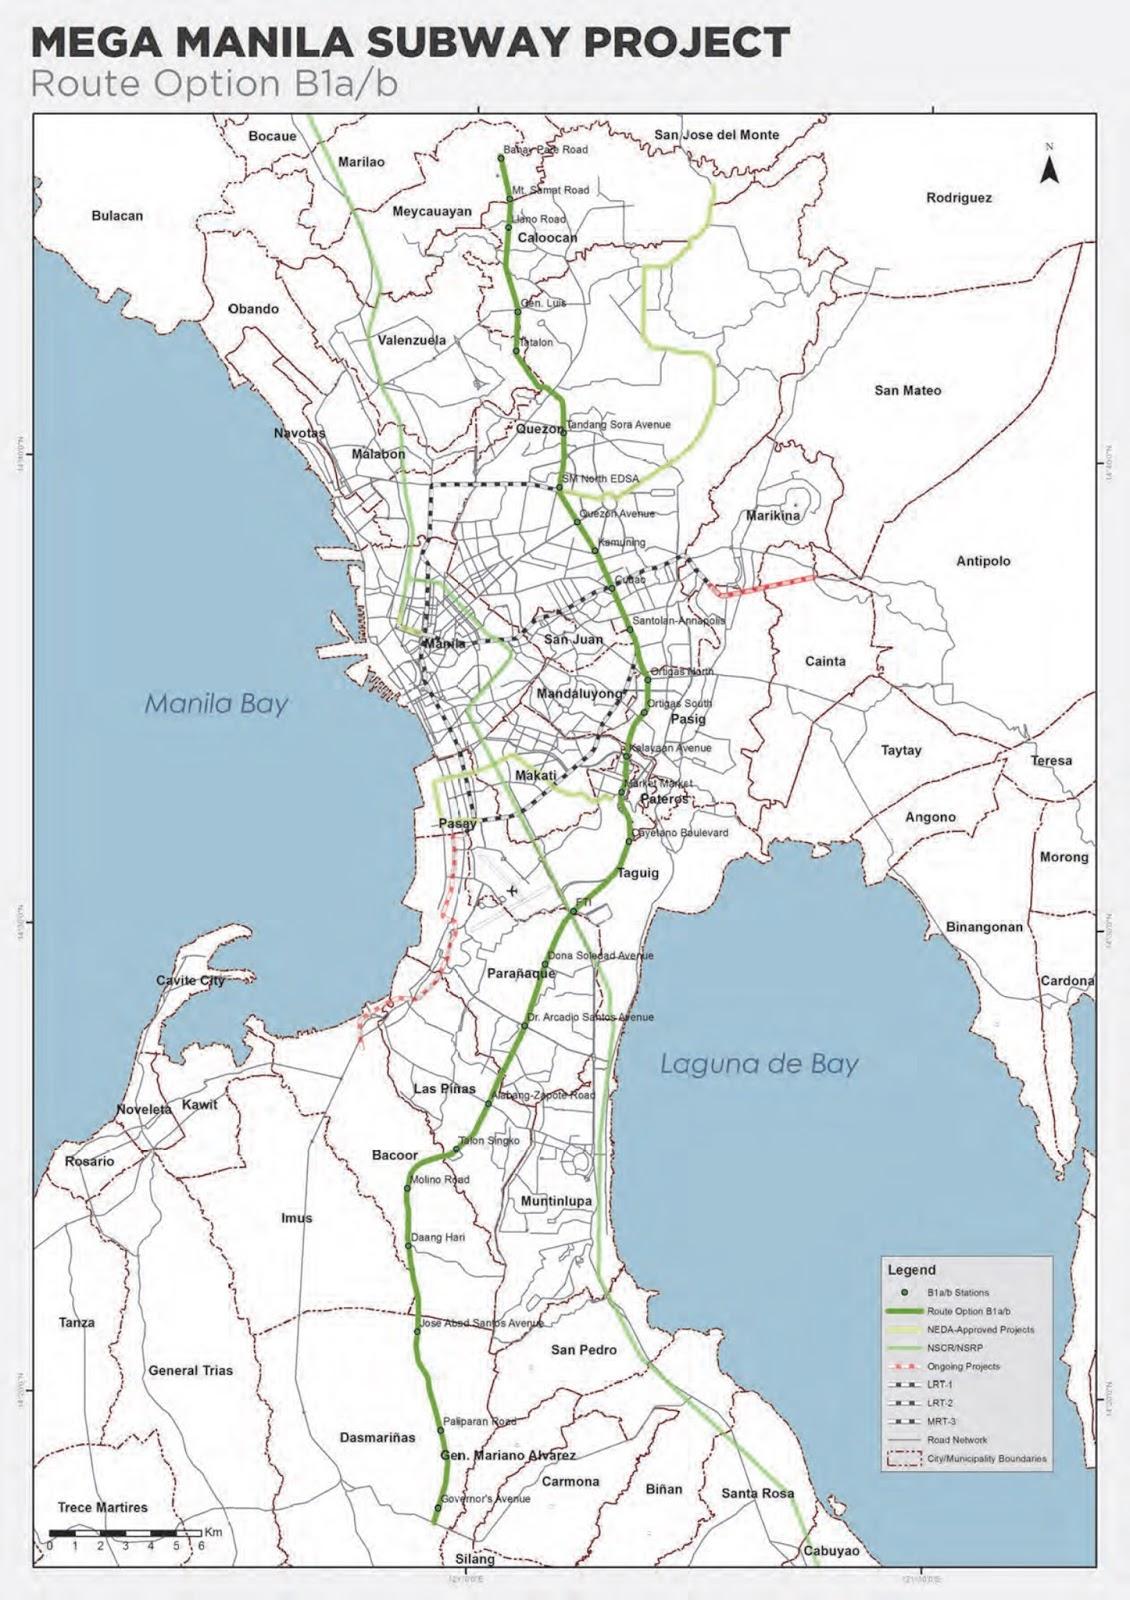 Mega Manila Subway Map.Inquirer Lifestyle Series Fitness Fashion With Samsung Mega Manila